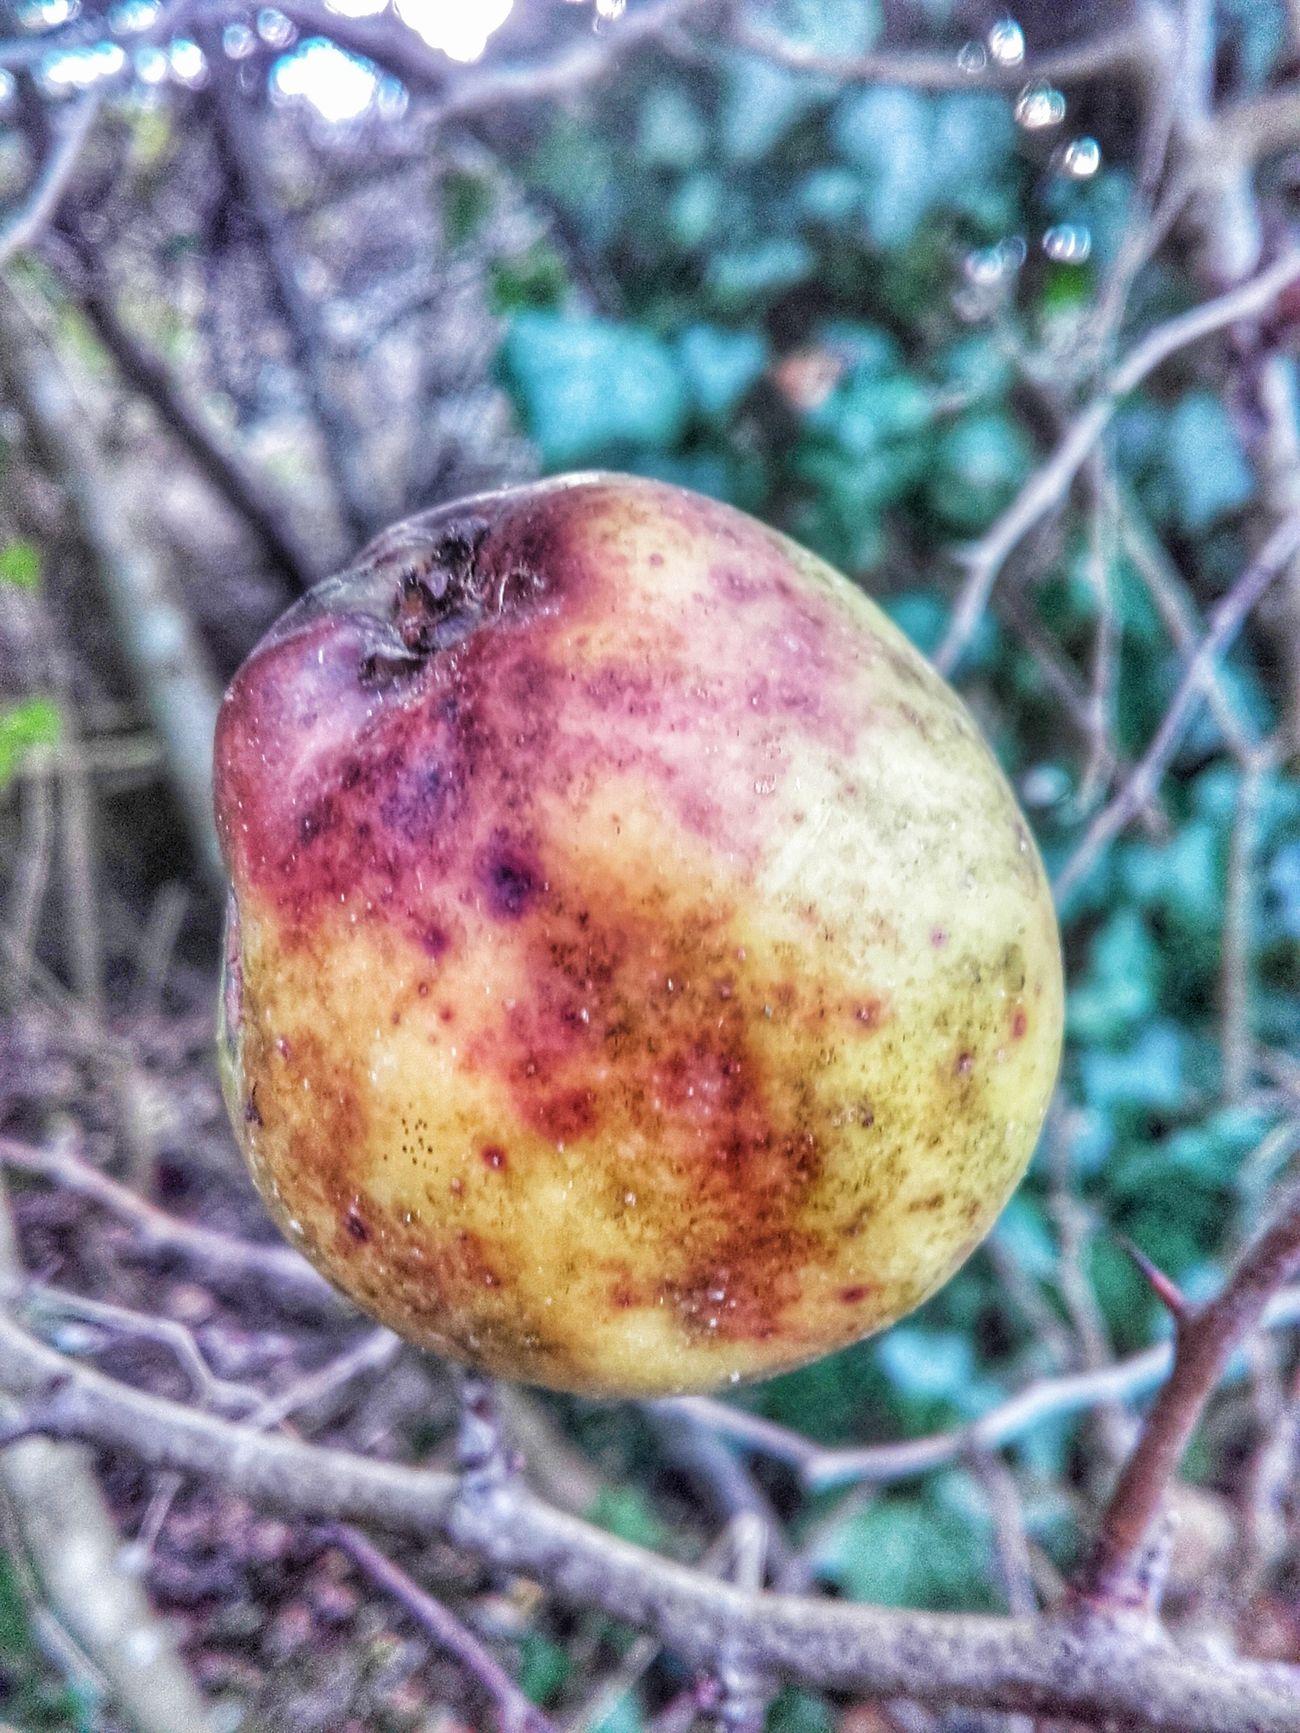 Friut Close-up Focus On Foreground Food Apple Apple - Fruit Old Oldfruit Rotting On Tree Mouldy Fruit